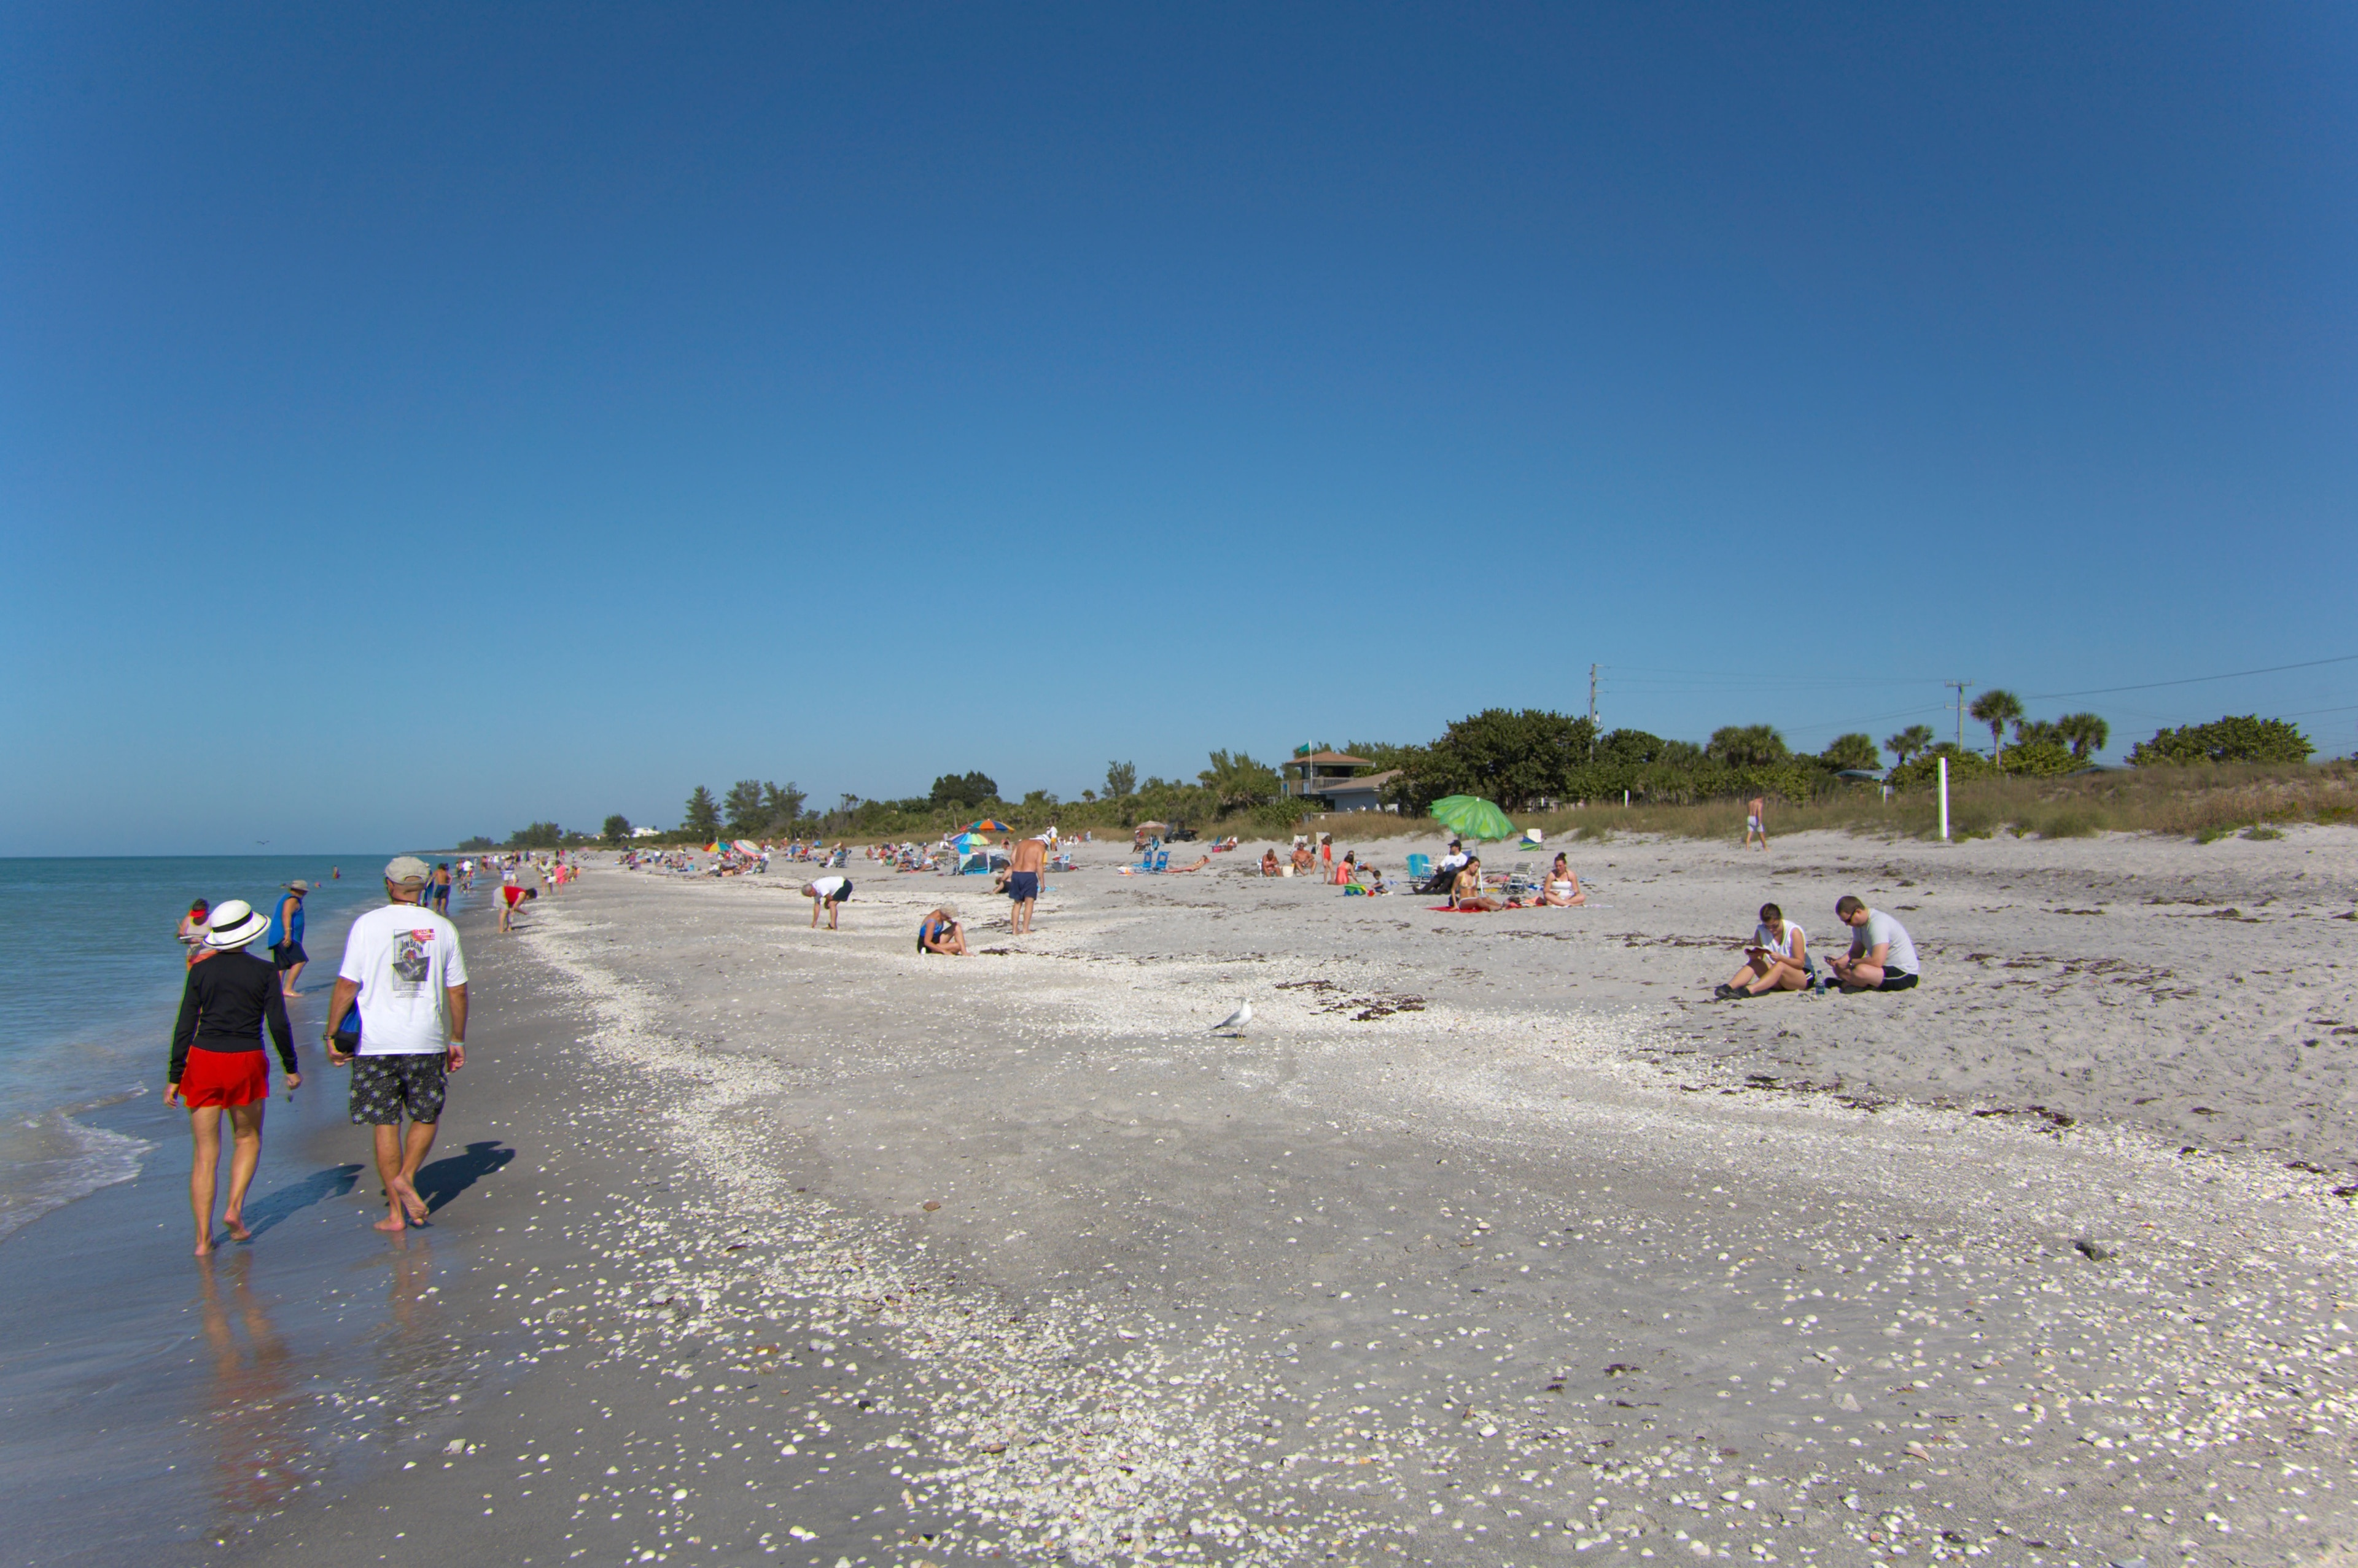 Manasota Beach Vacation Rentals: house rentals & more | Vrbo